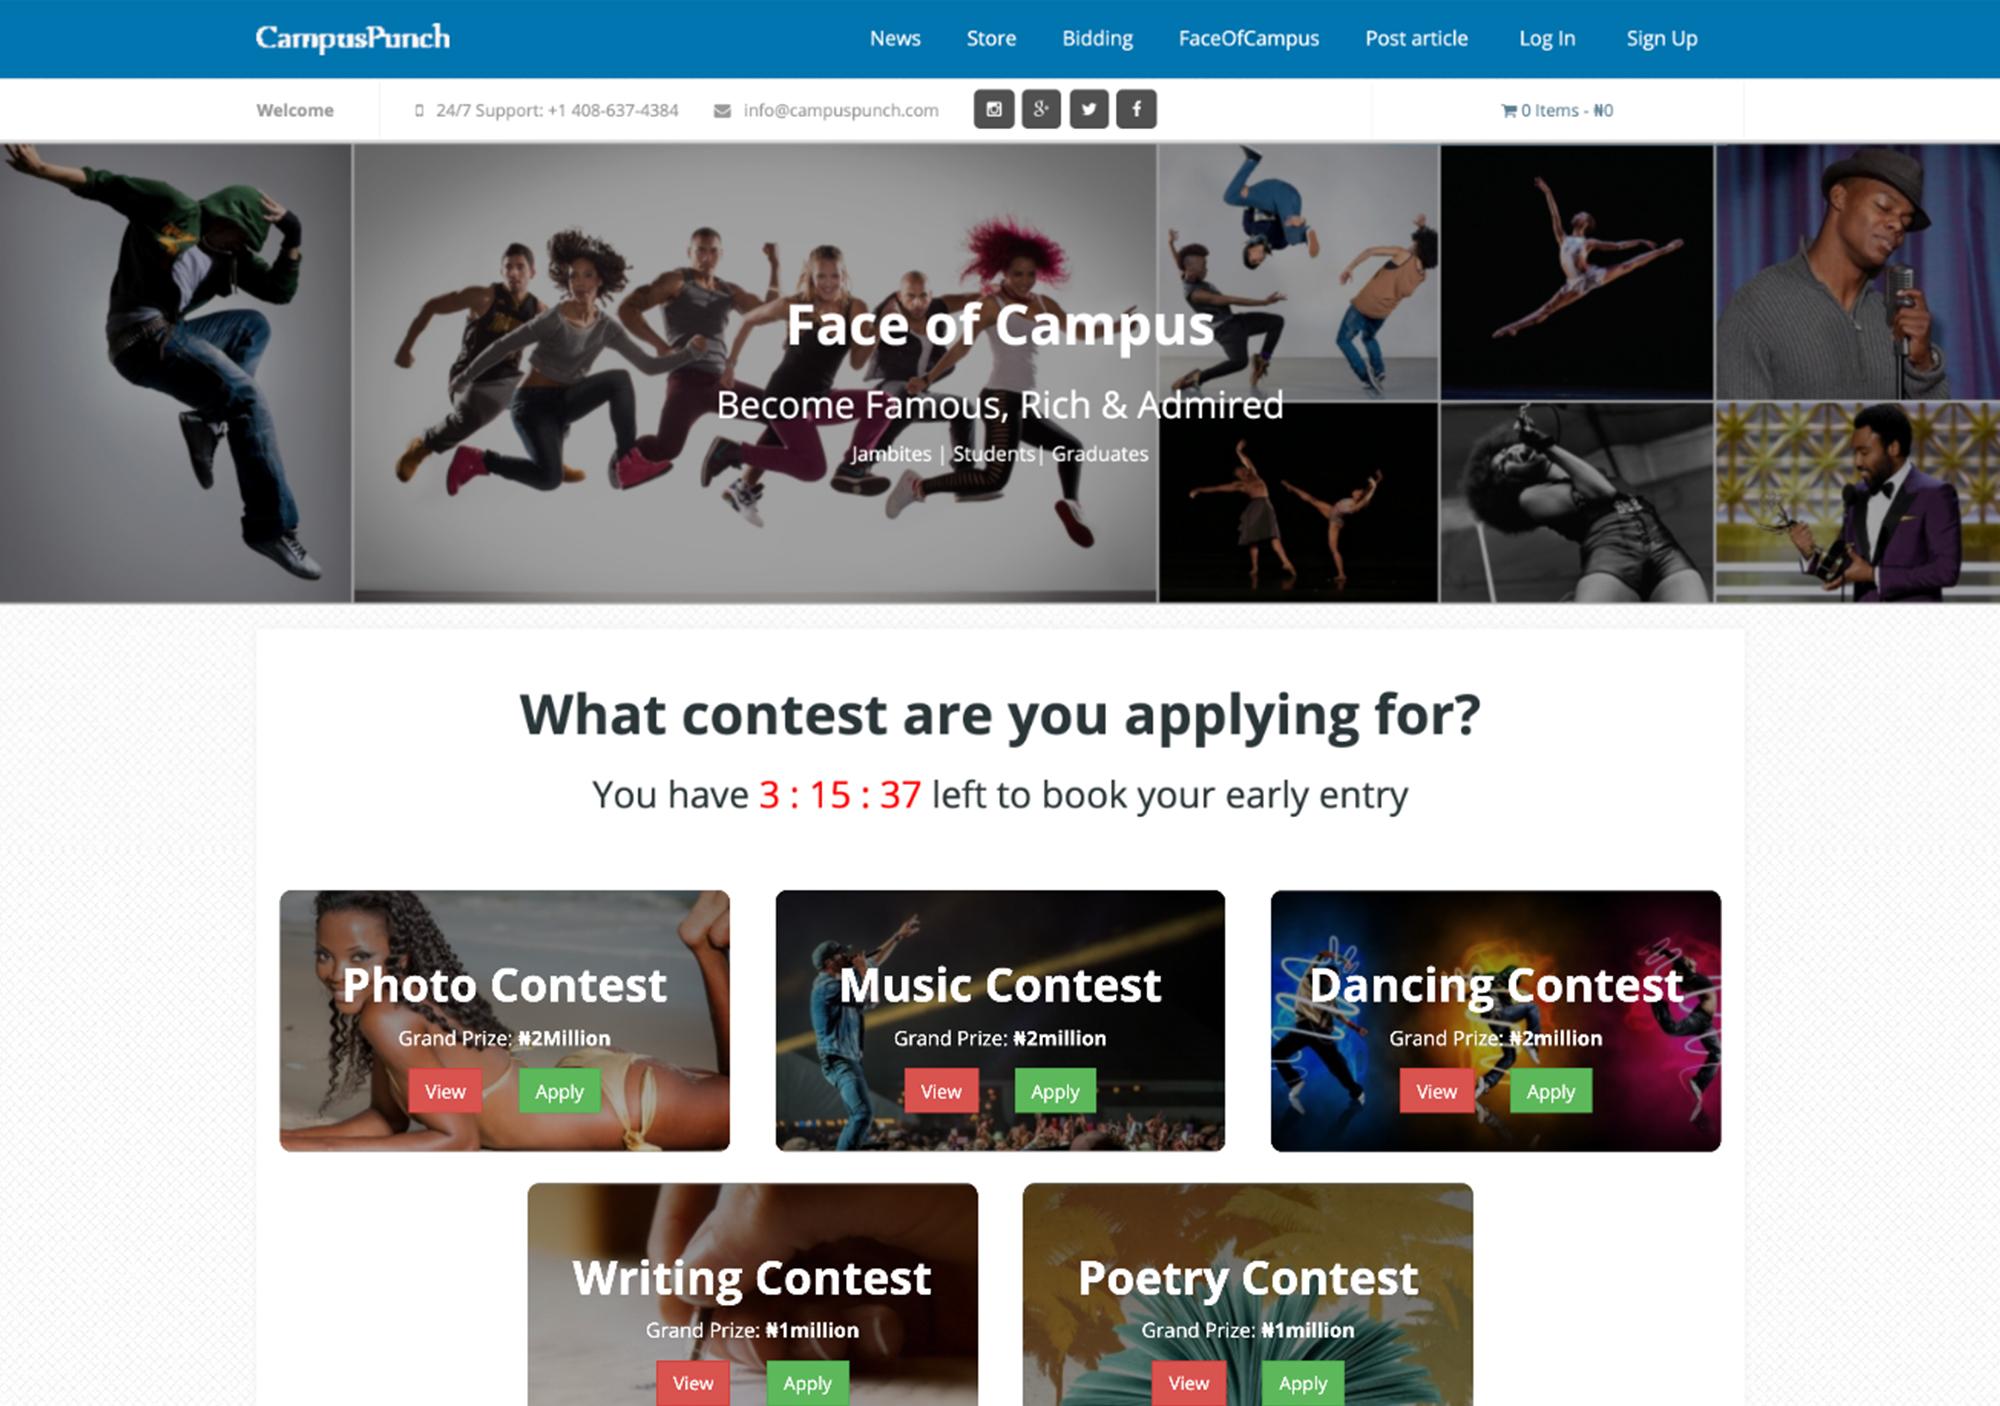 CampusPunch - Anchora Technologies